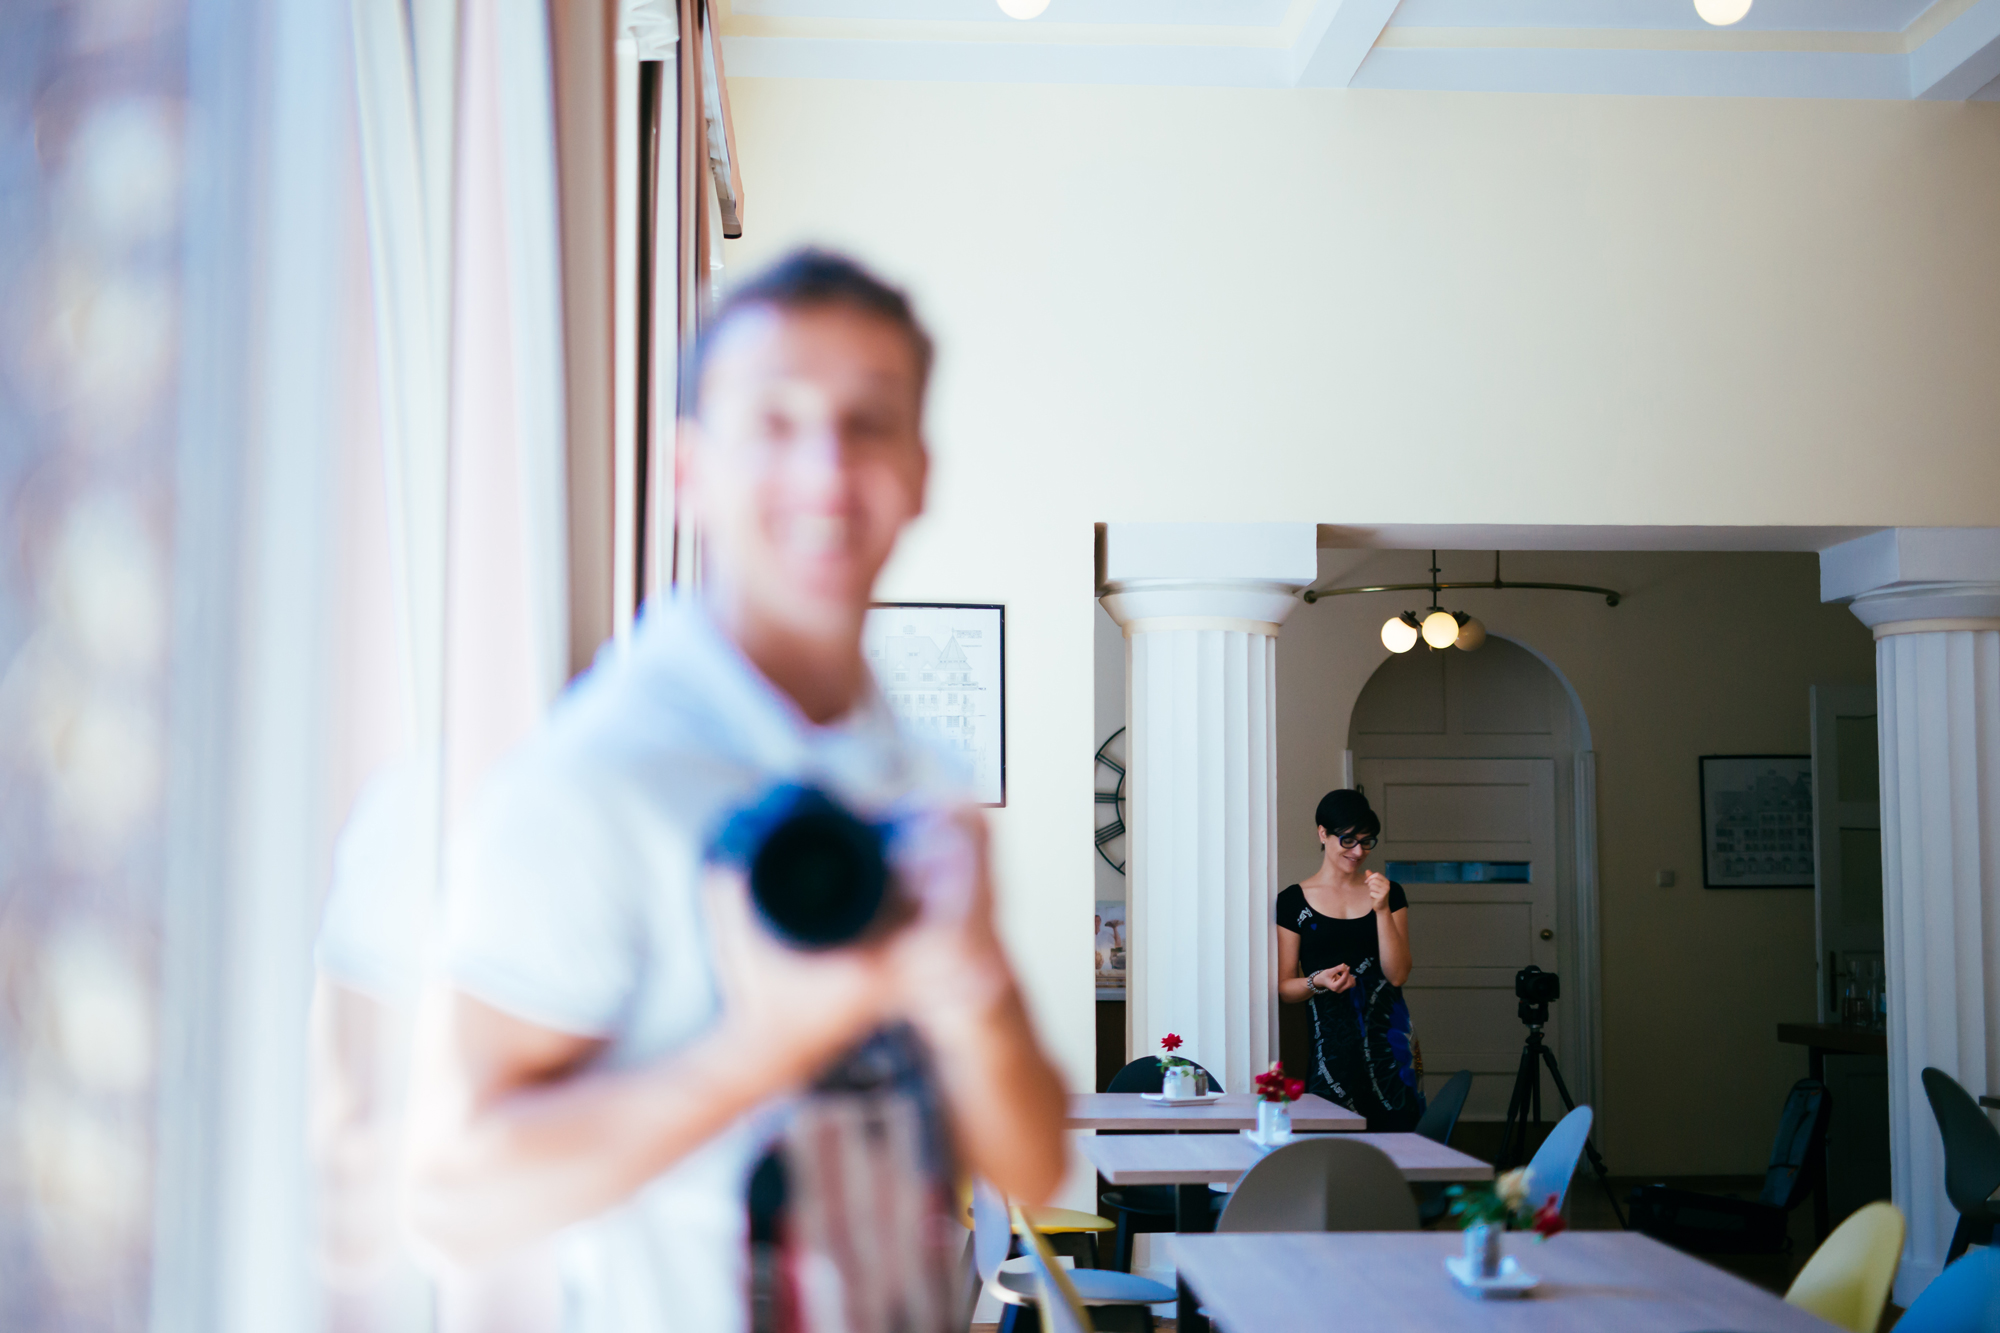 Hinter den Kulissen beim Fotoshooting im Hotel Carinthia